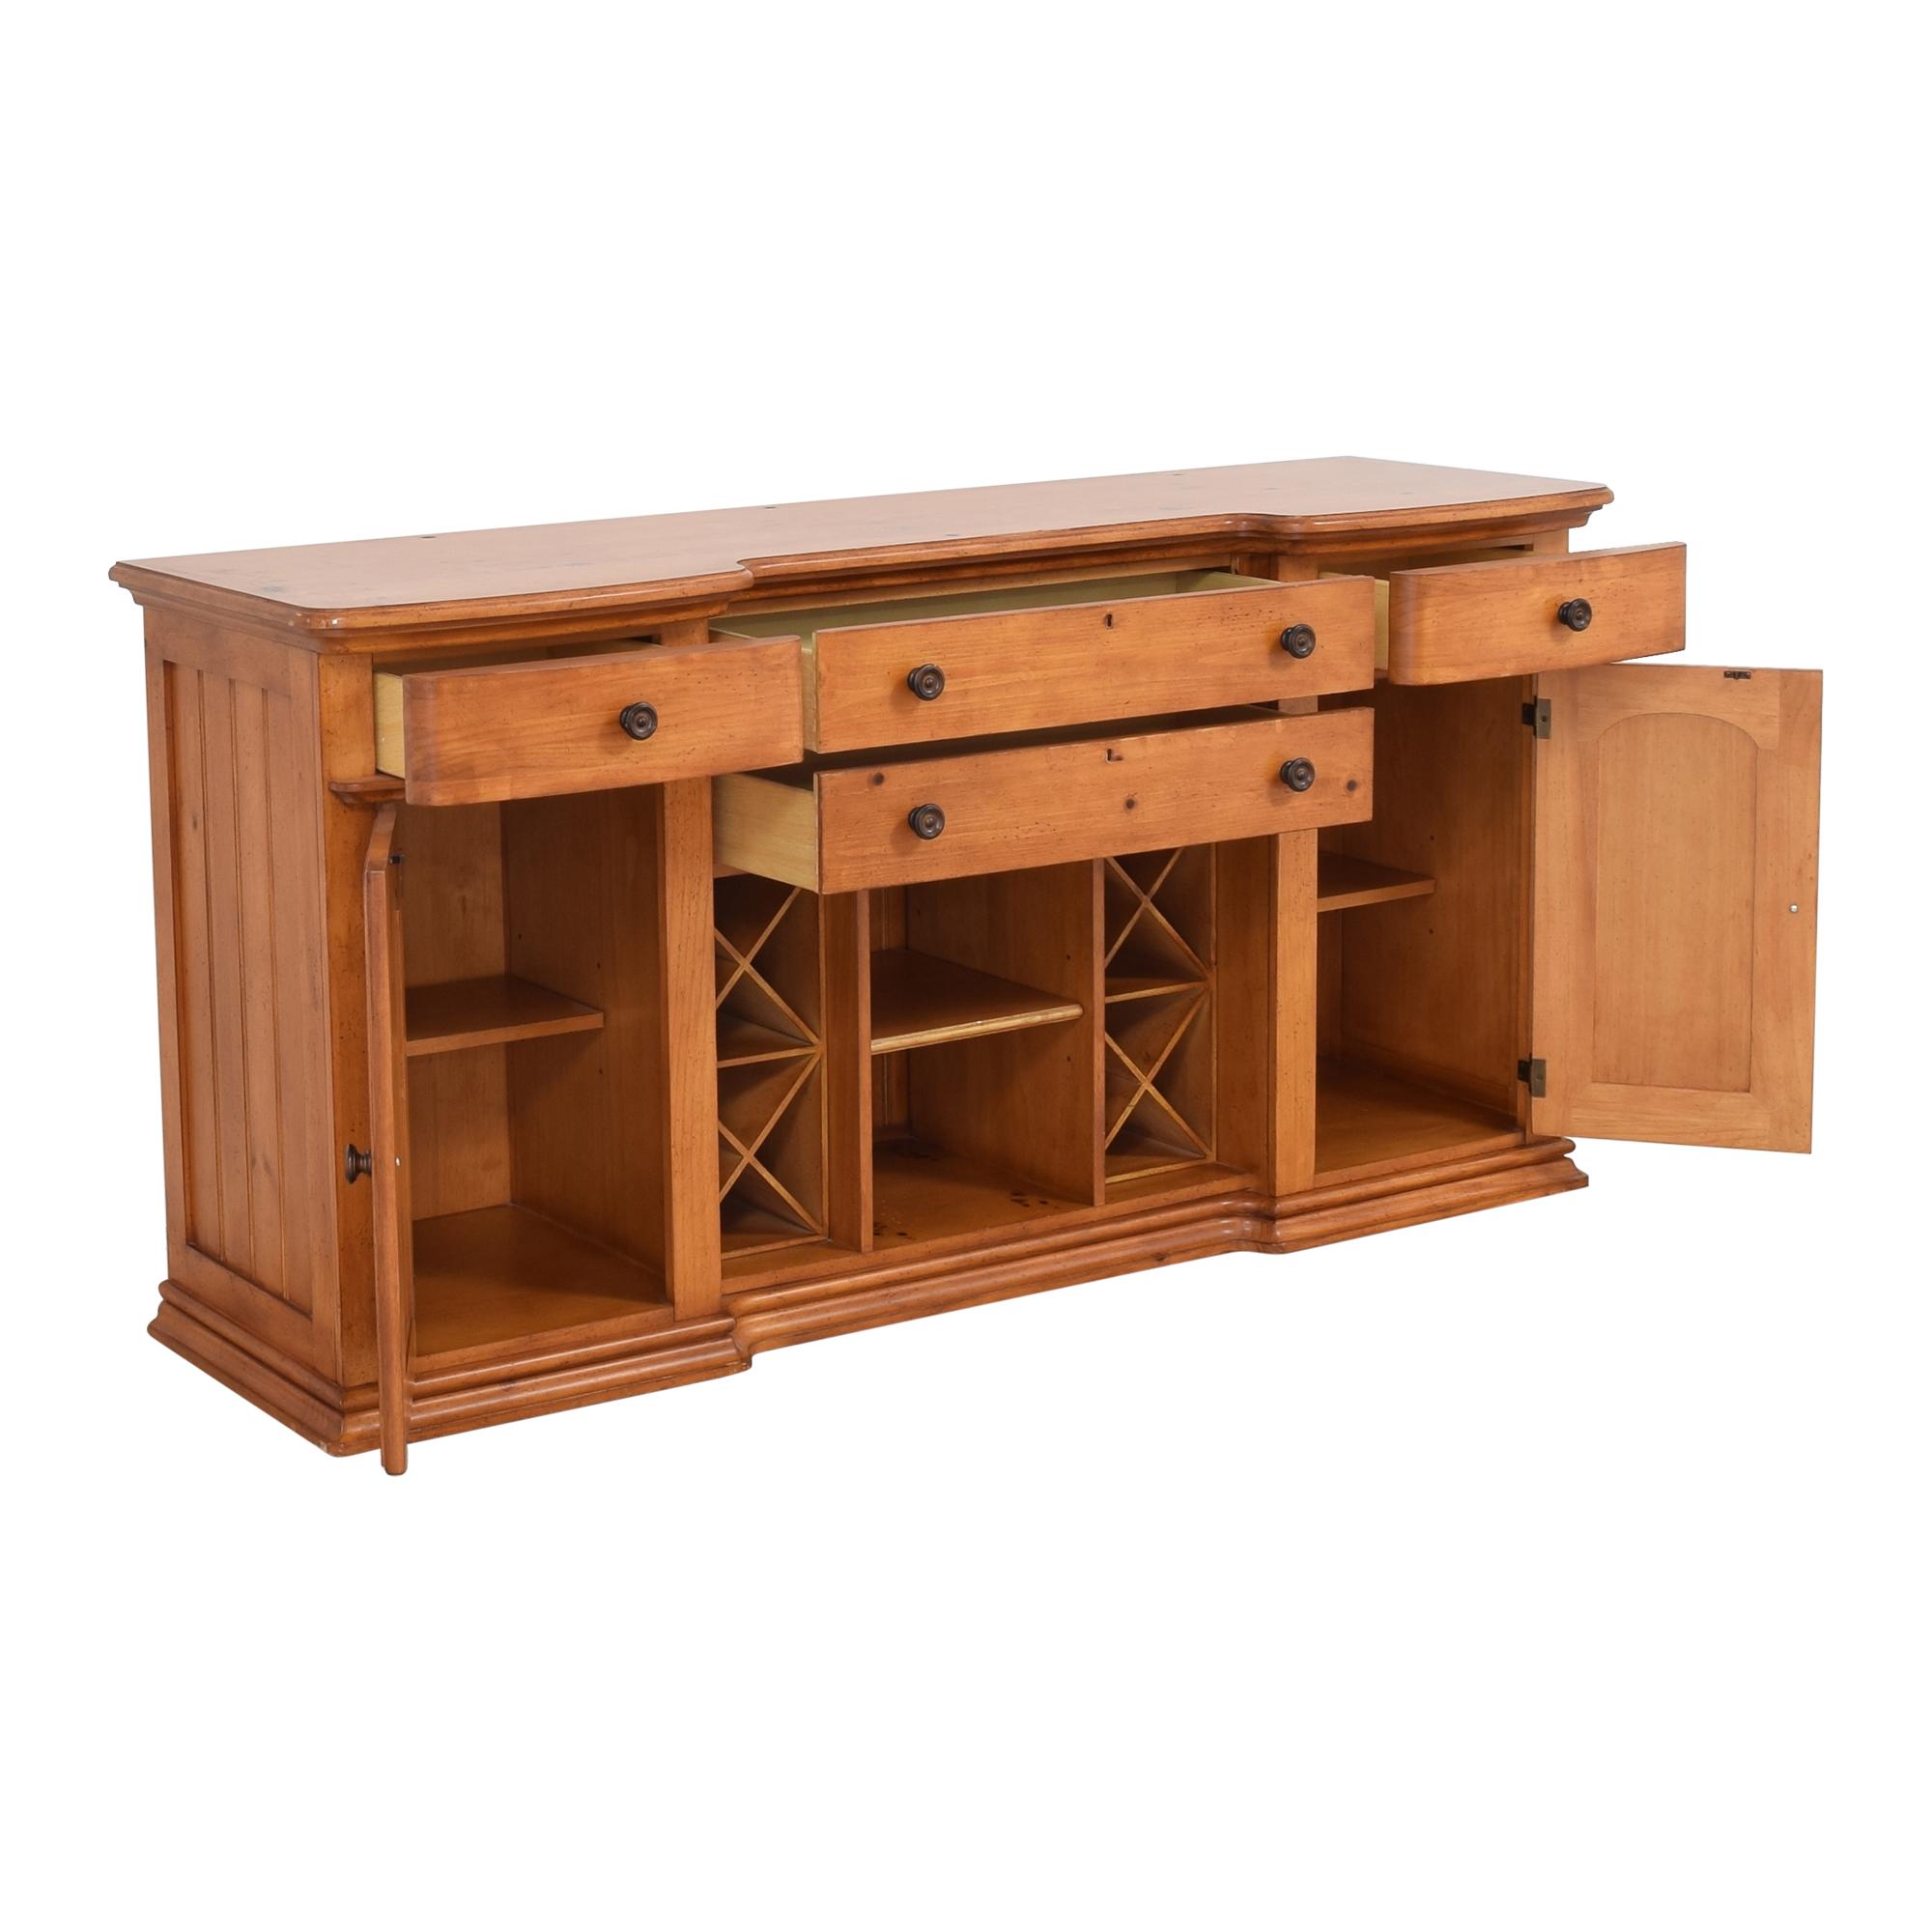 Stanley Furniture Stanley Furniture Cottage Revival Vineyard Service Cabinet discount